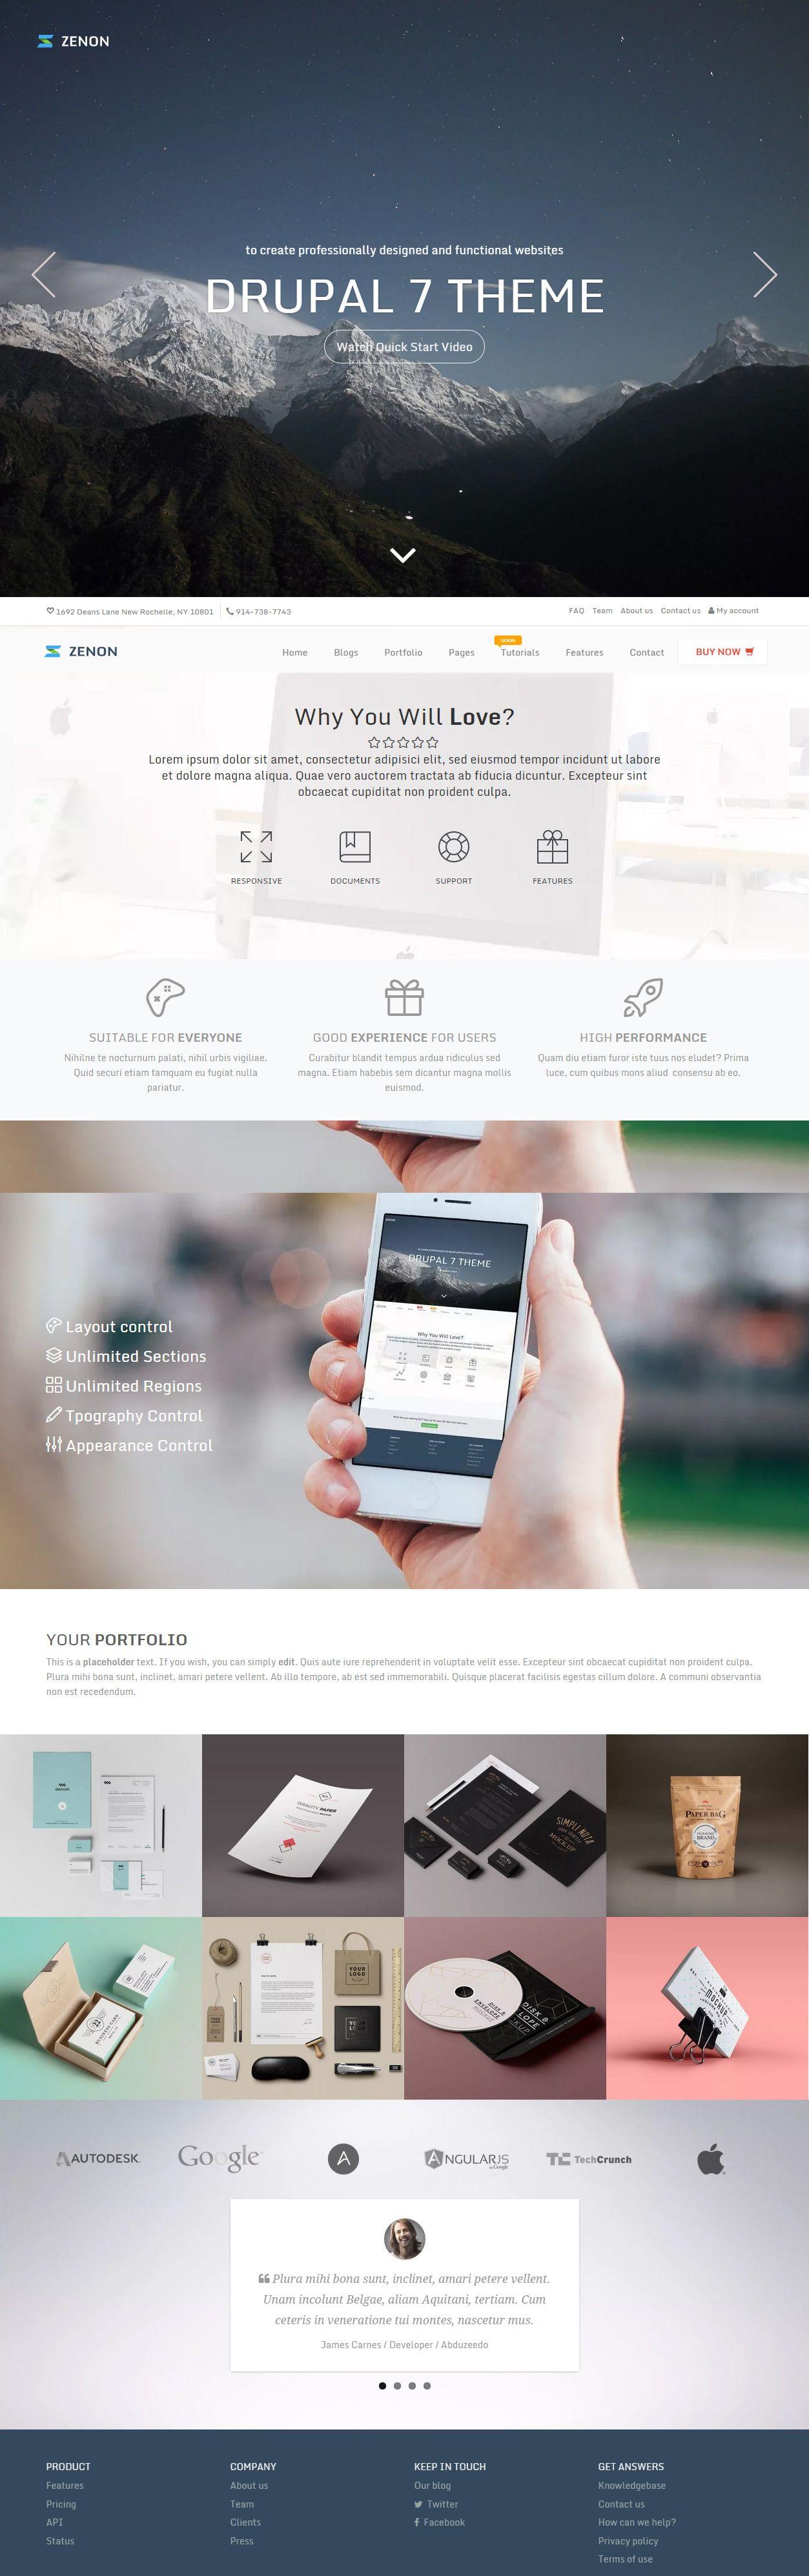 Zenon Premium Responsive Multipurpose Drupal 7 Theme Drupal Theme Website Design